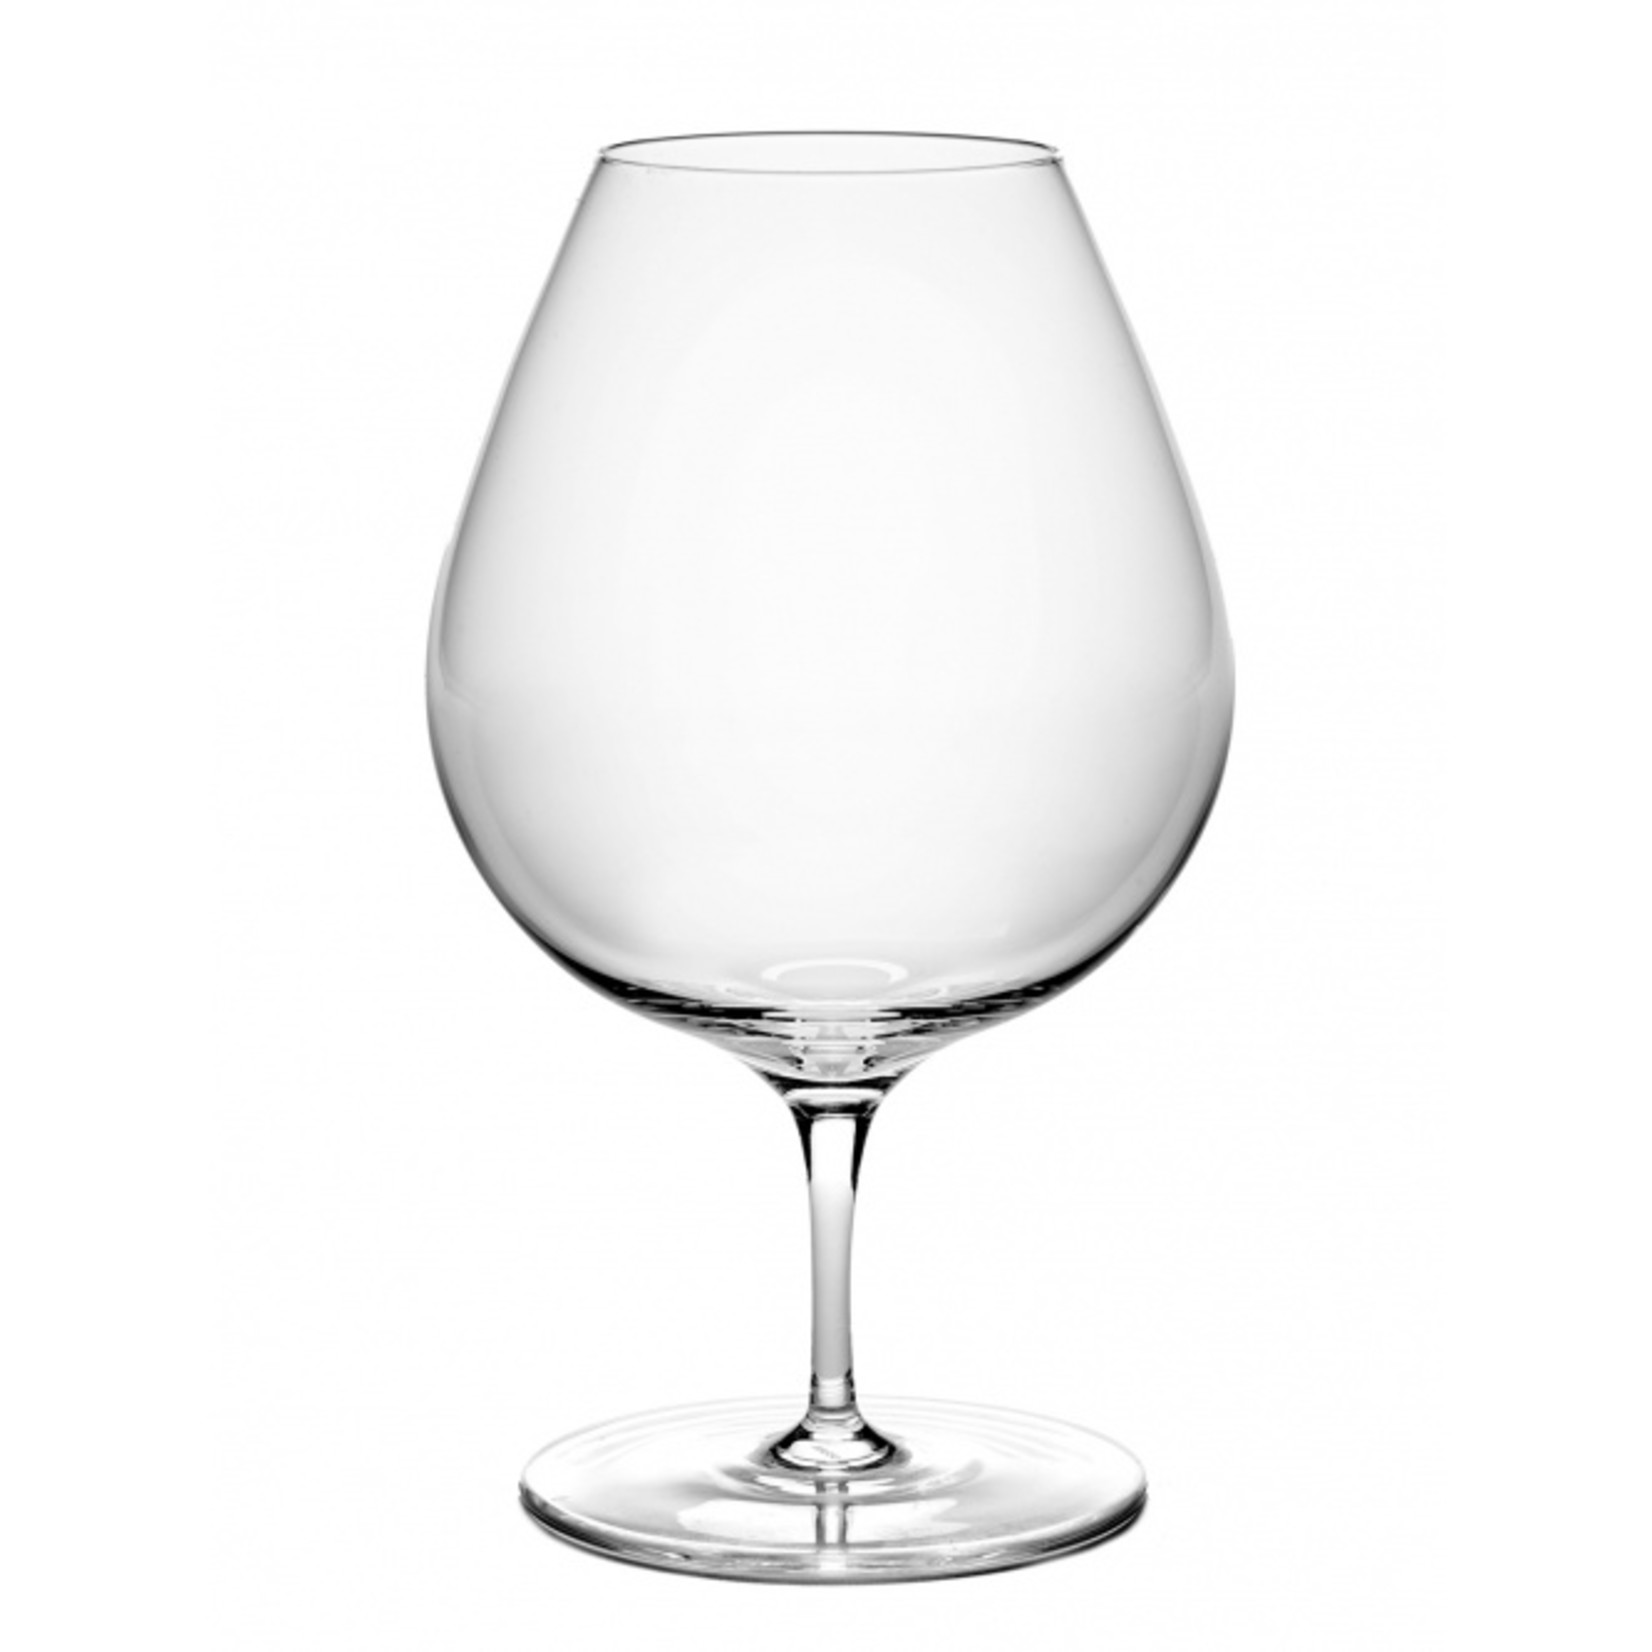 Sergio Herman Inku Rode wijn glas Inku